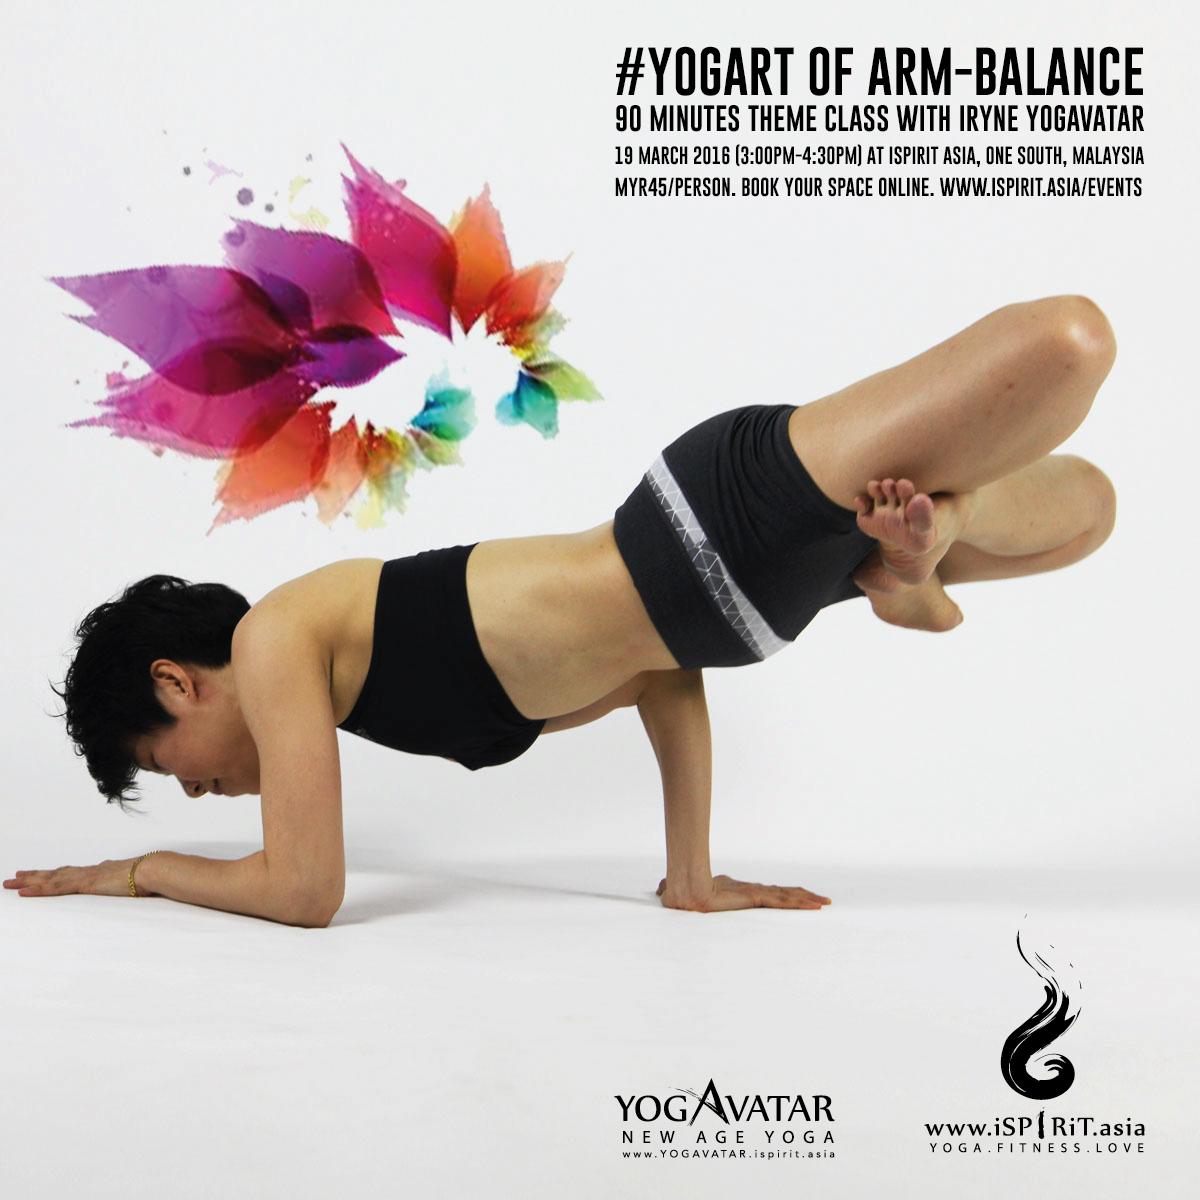 Yogurt Of Arm Balance with iRyne Yogavatar poster v3